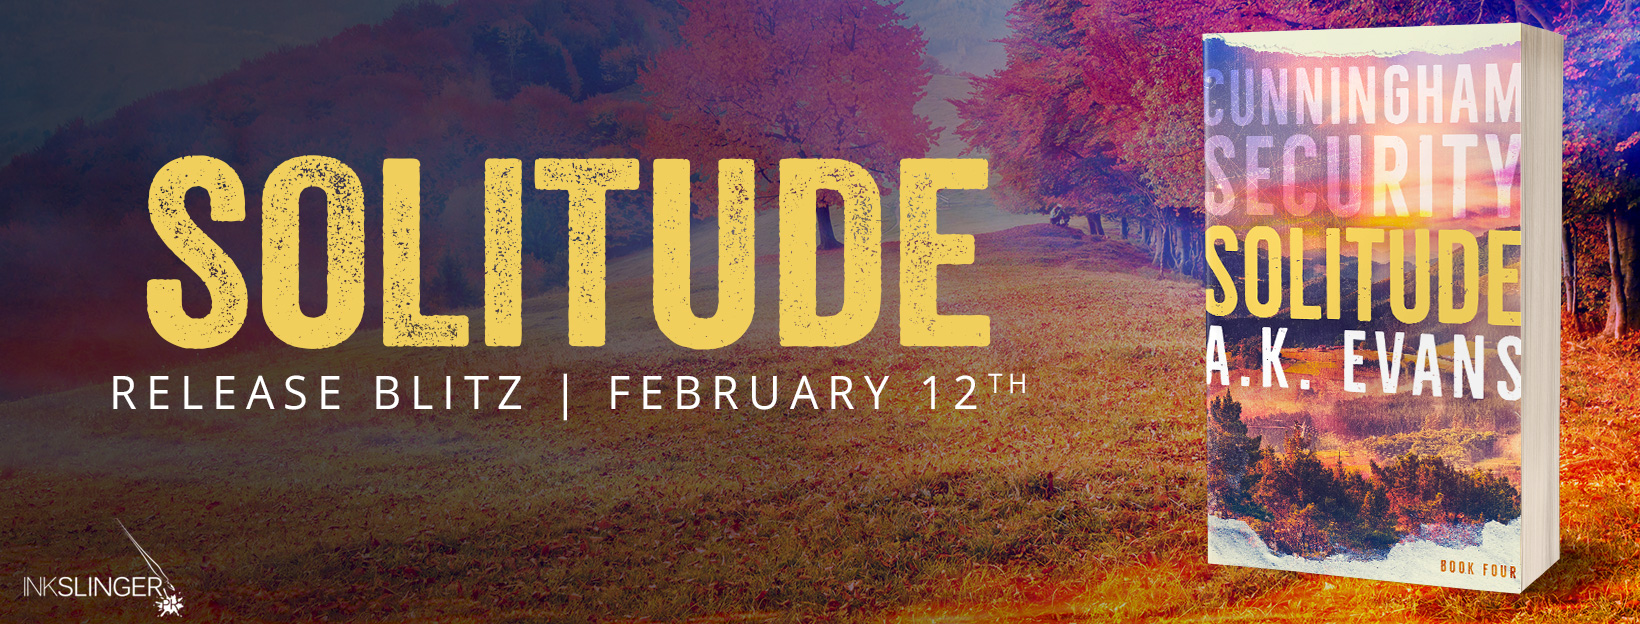 Solitude-RB.jpg